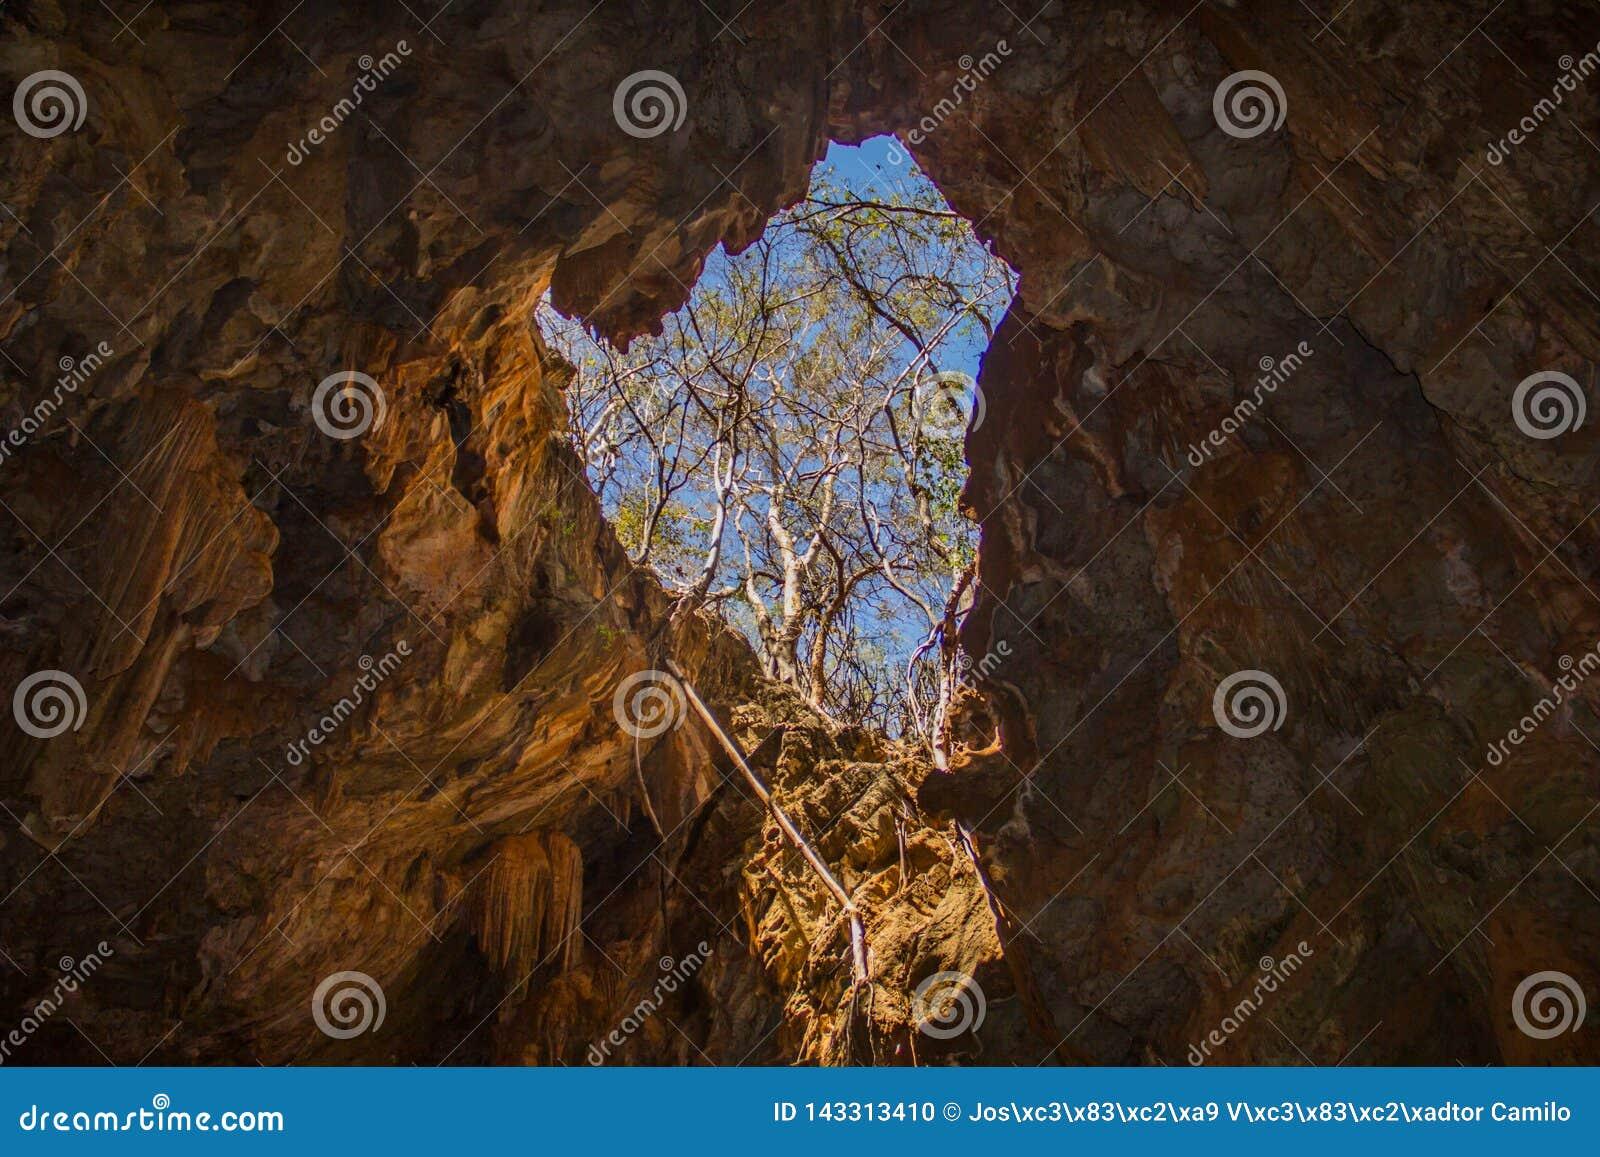 Mangabeira-Höhle, in Ituaçu, Chapada Diamantina